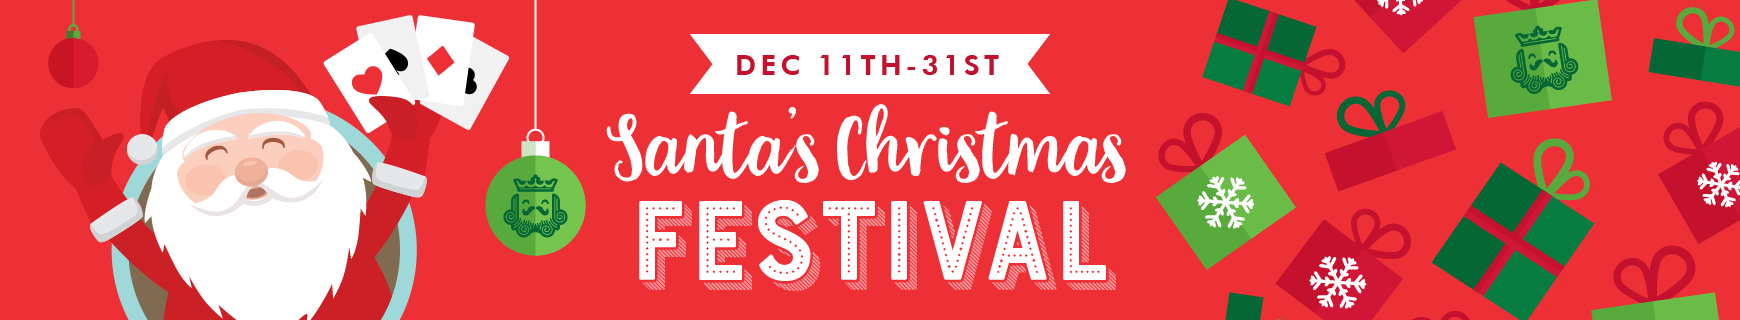 Santa s chrismas festival  870 x 160  v2 2x